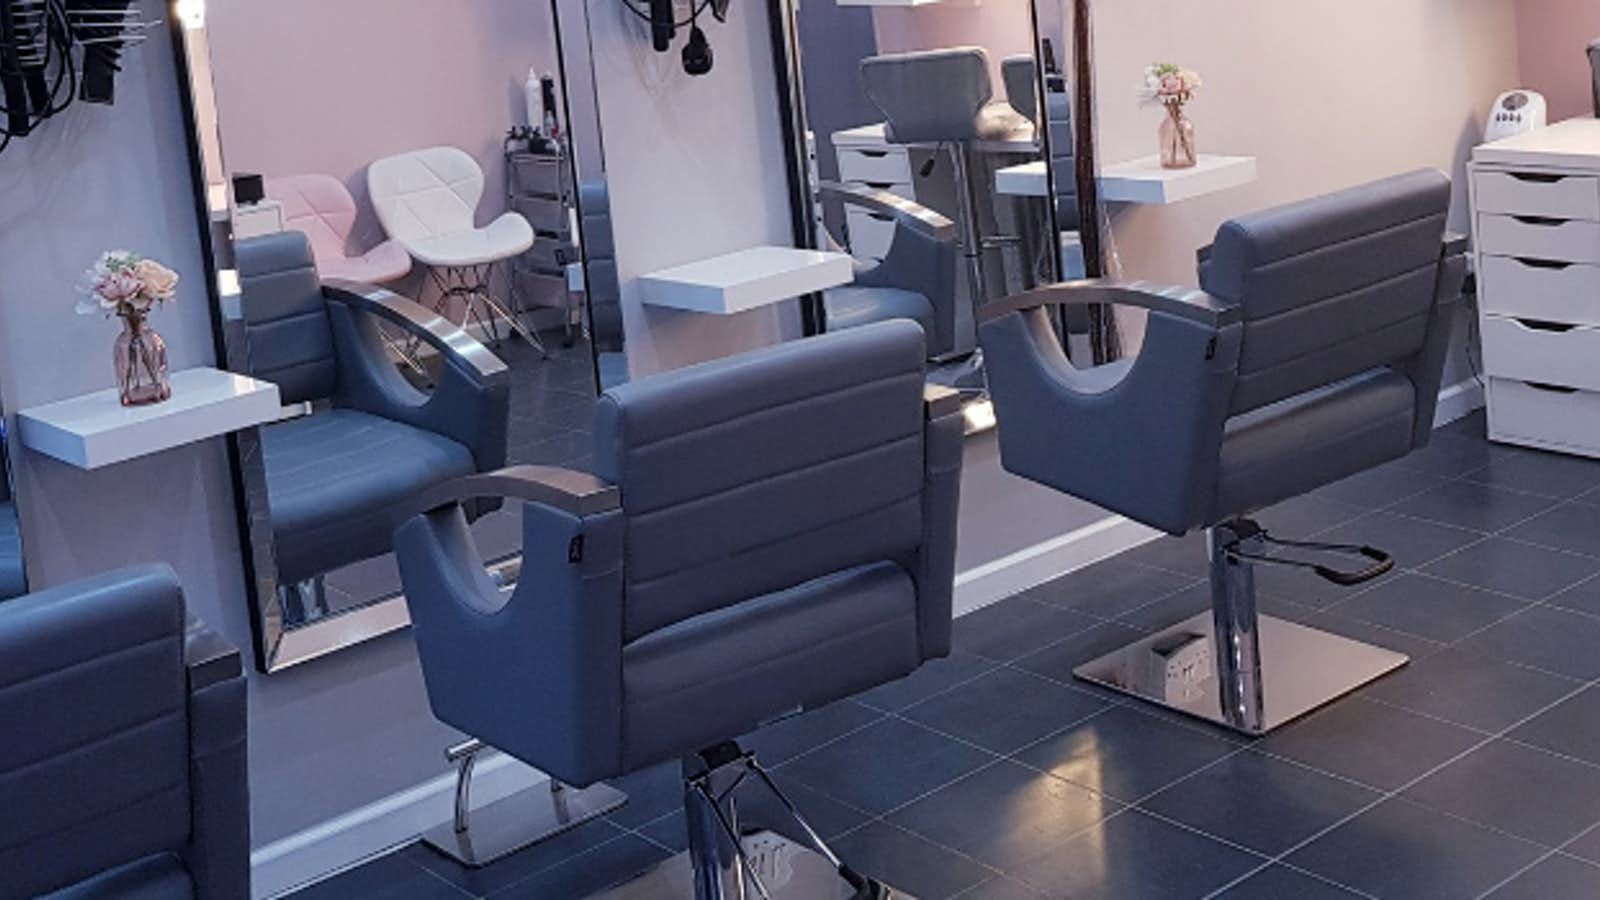 Partick U Lar Hair & Beauty Salon